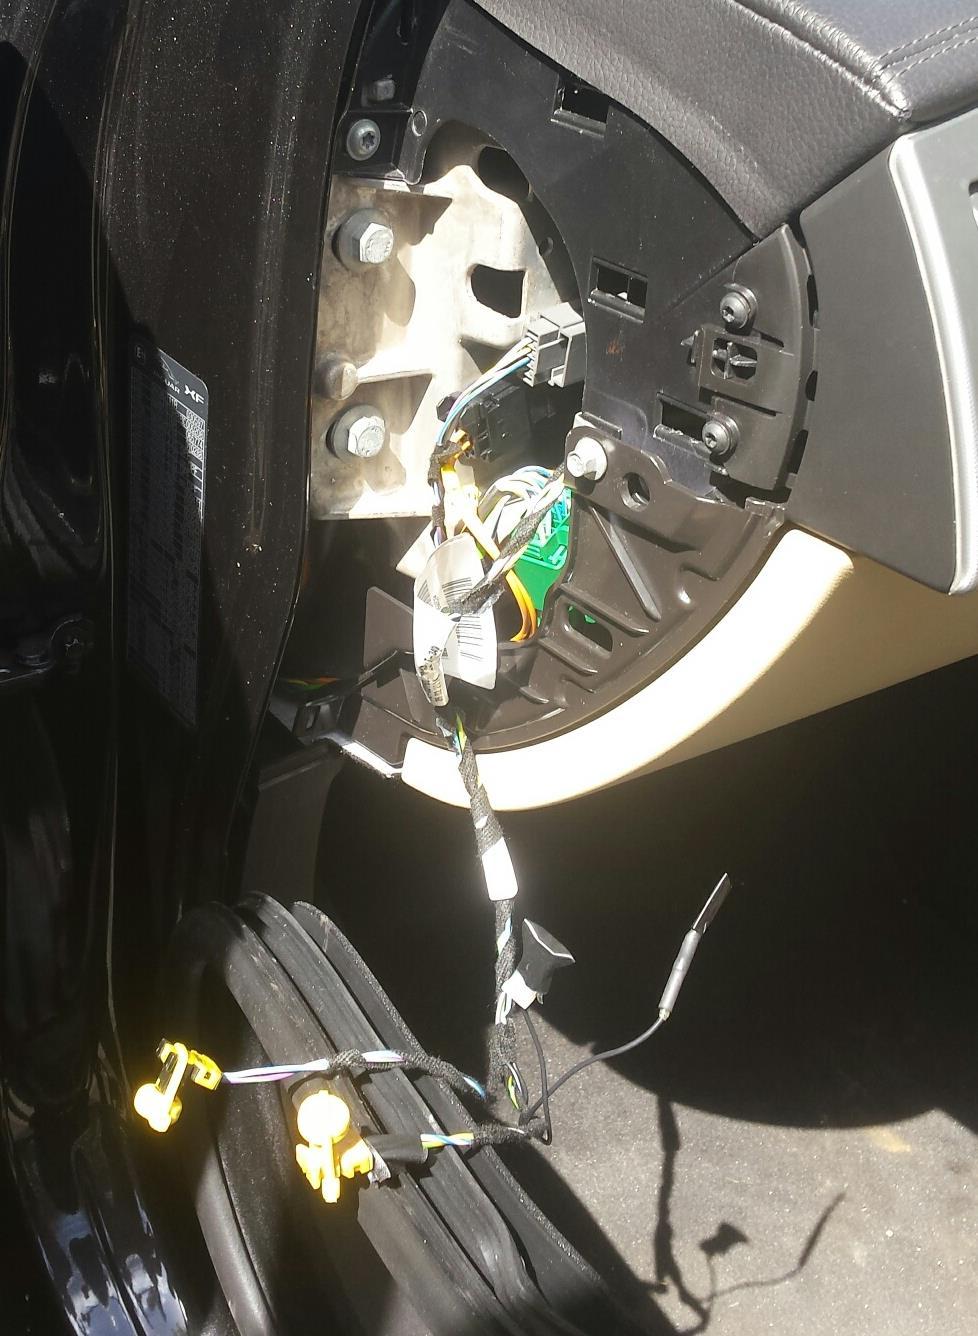 Focus Wiring Diagram Further Bmw E36 Radio Wiring Diagram Moreover Bmw